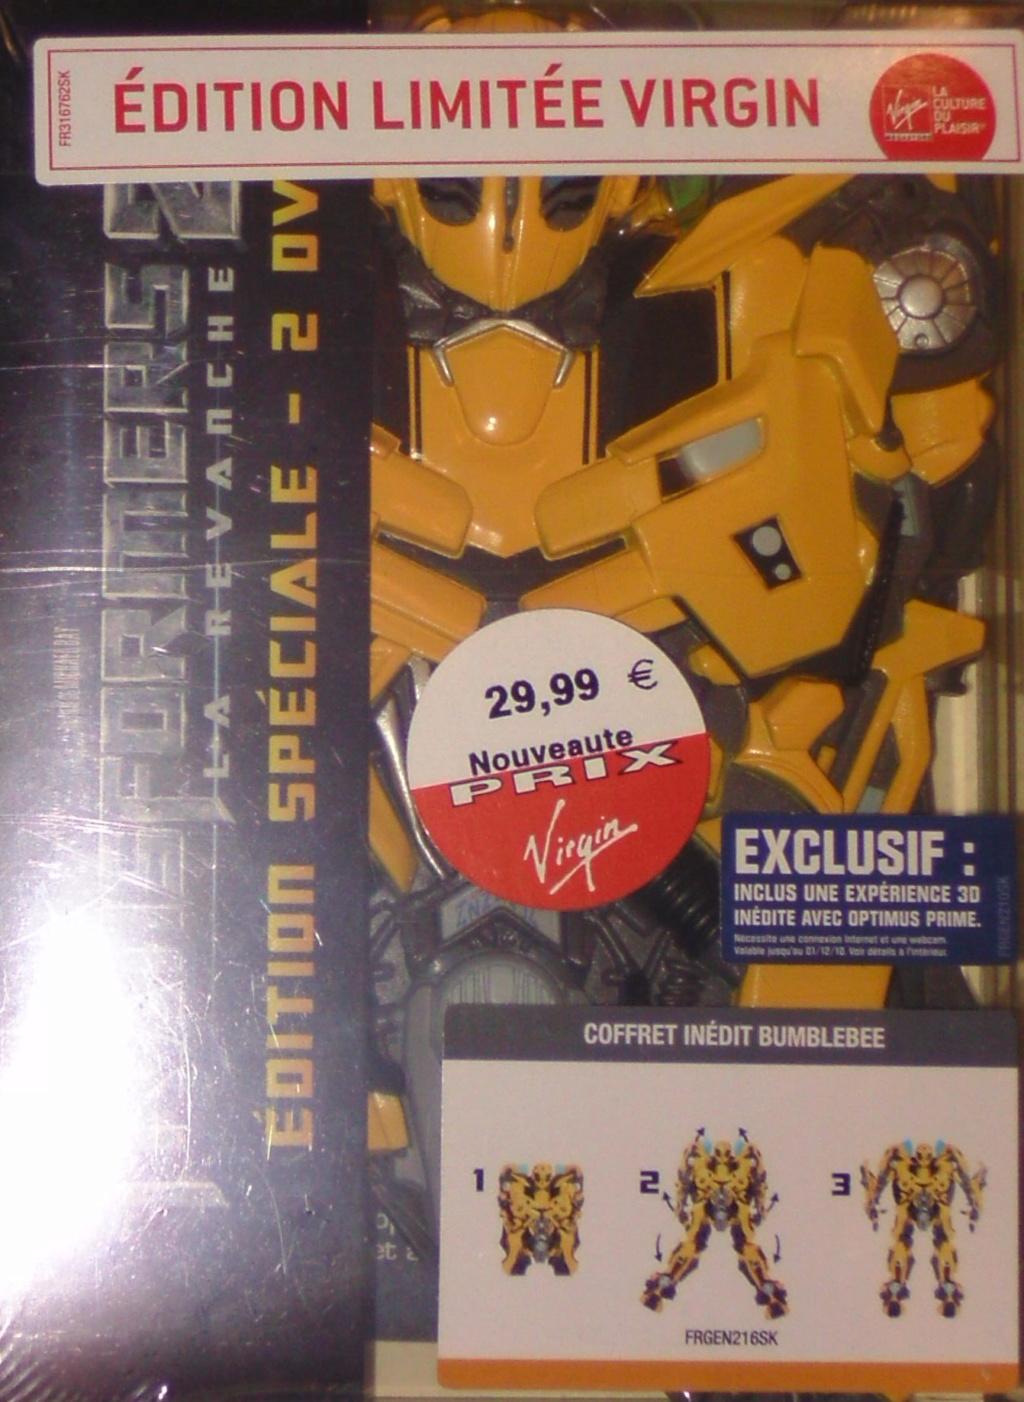 Achat des DVD et Blu-ray des Films Transformers - Page 9 Tf210